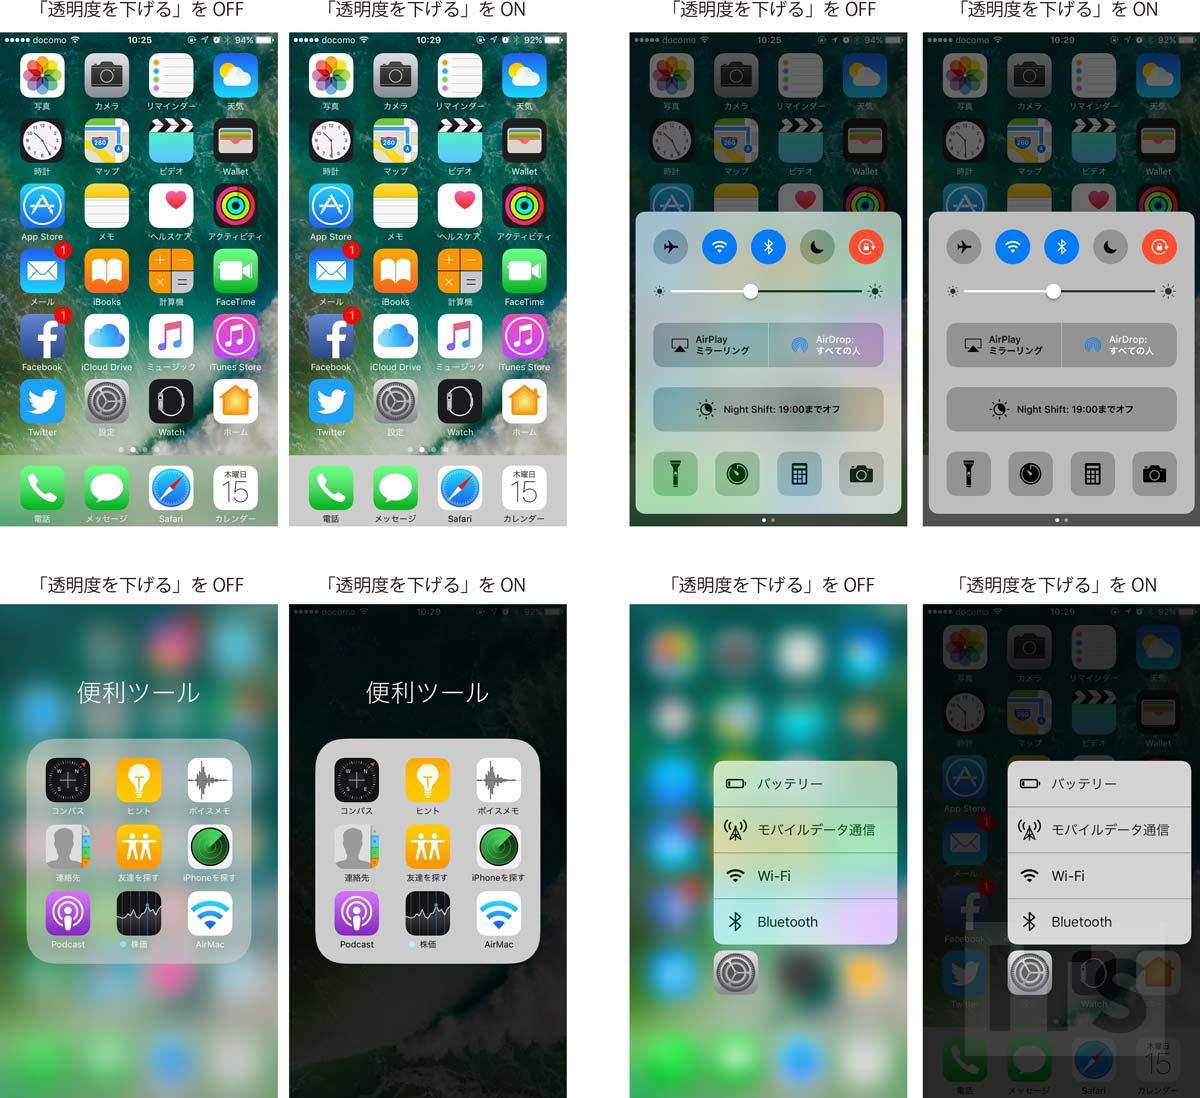 iOS10 透明度を下げる